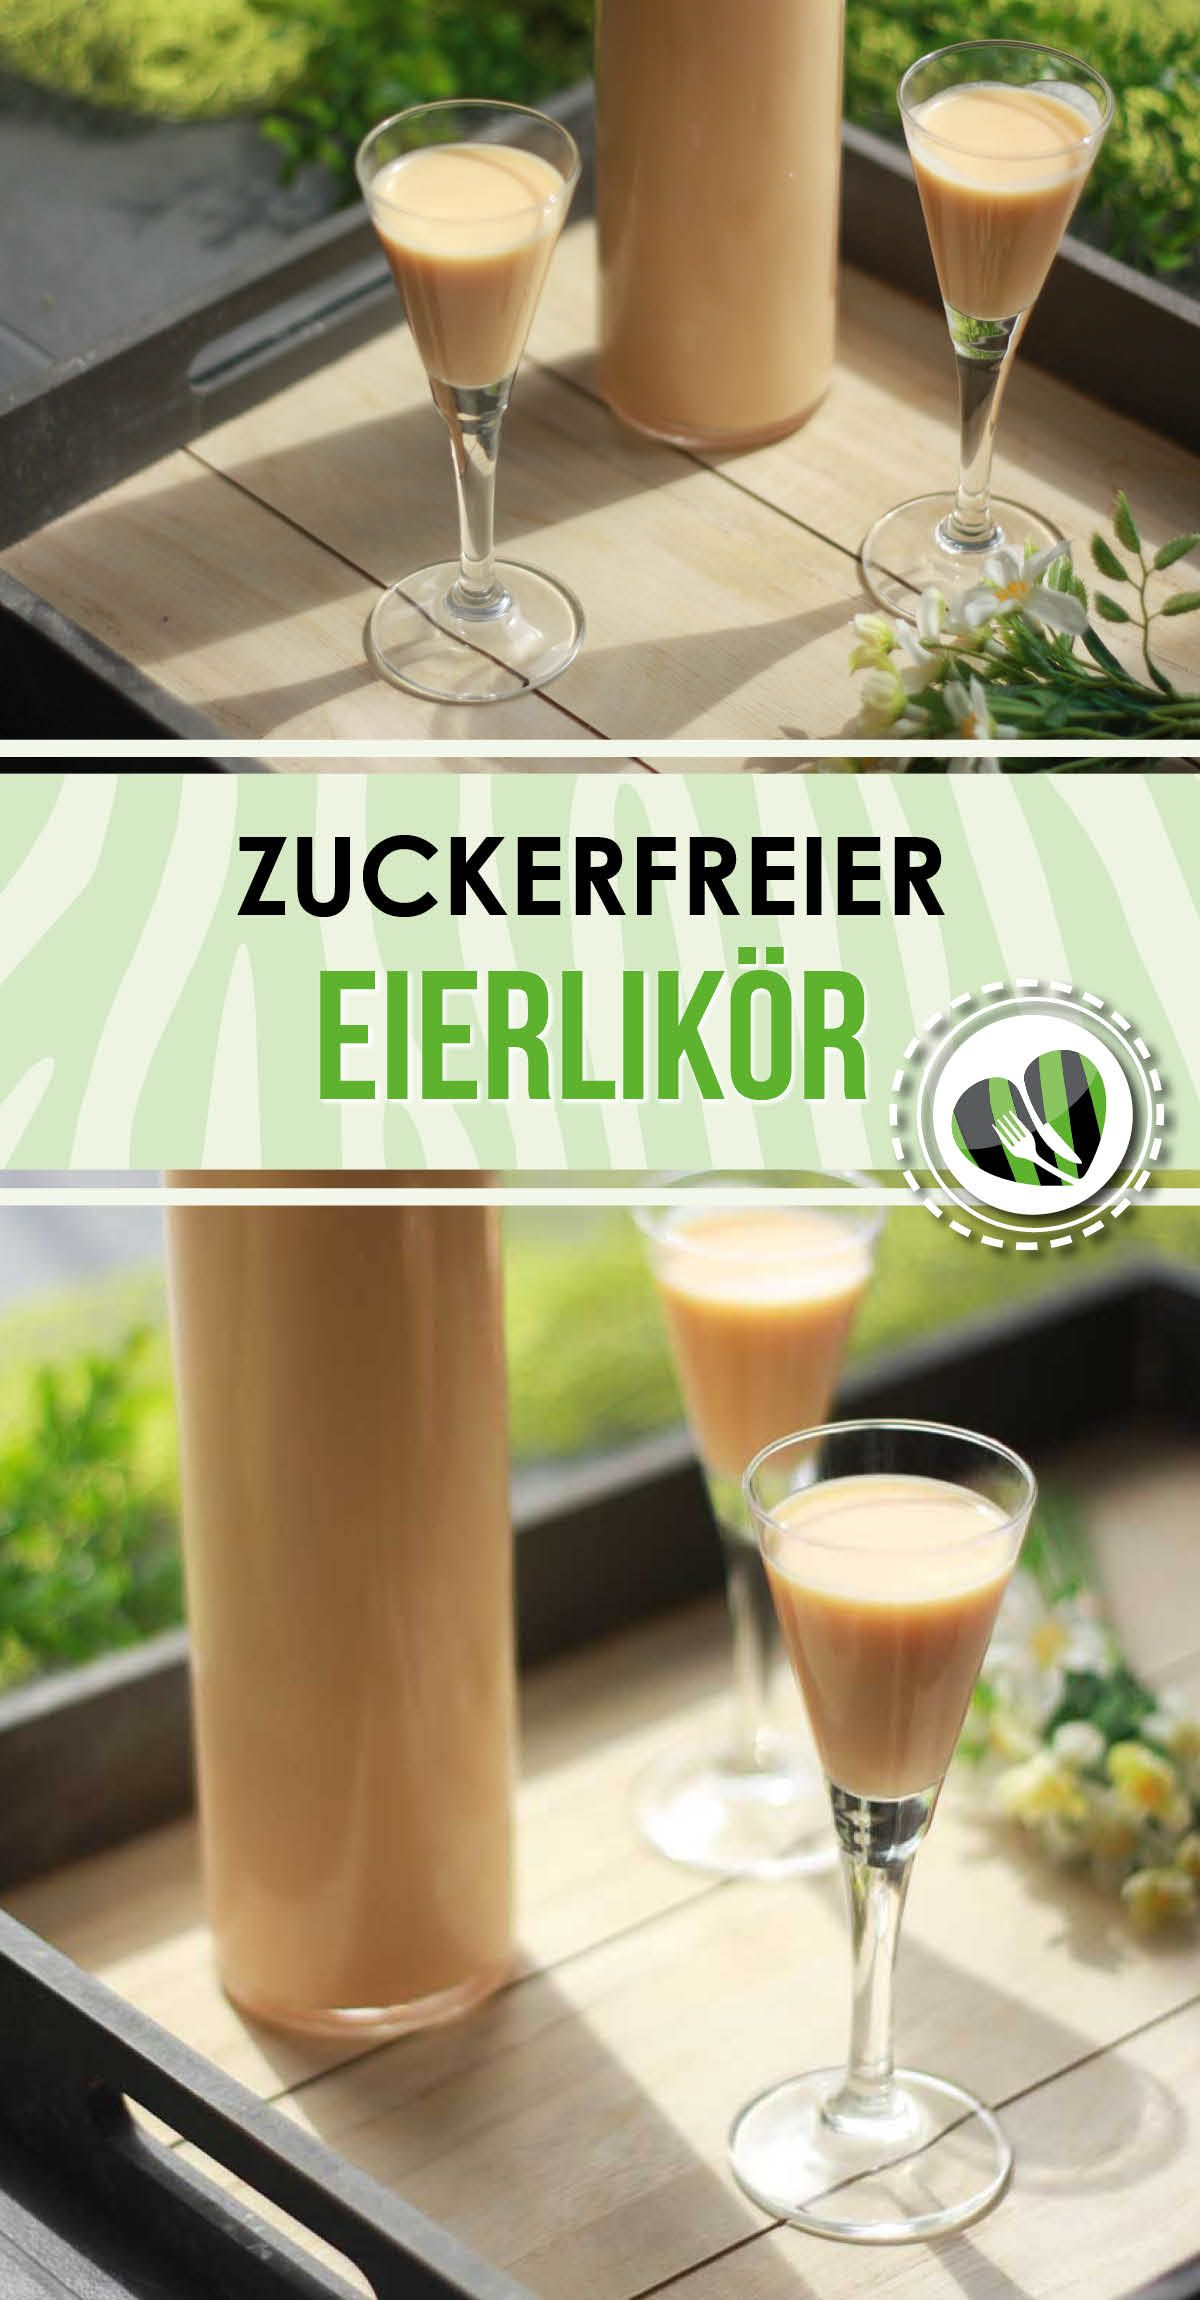 Nachgekocht: Zuckerfreier Eierlikör | Low Carb Getränke | Pinterest ...